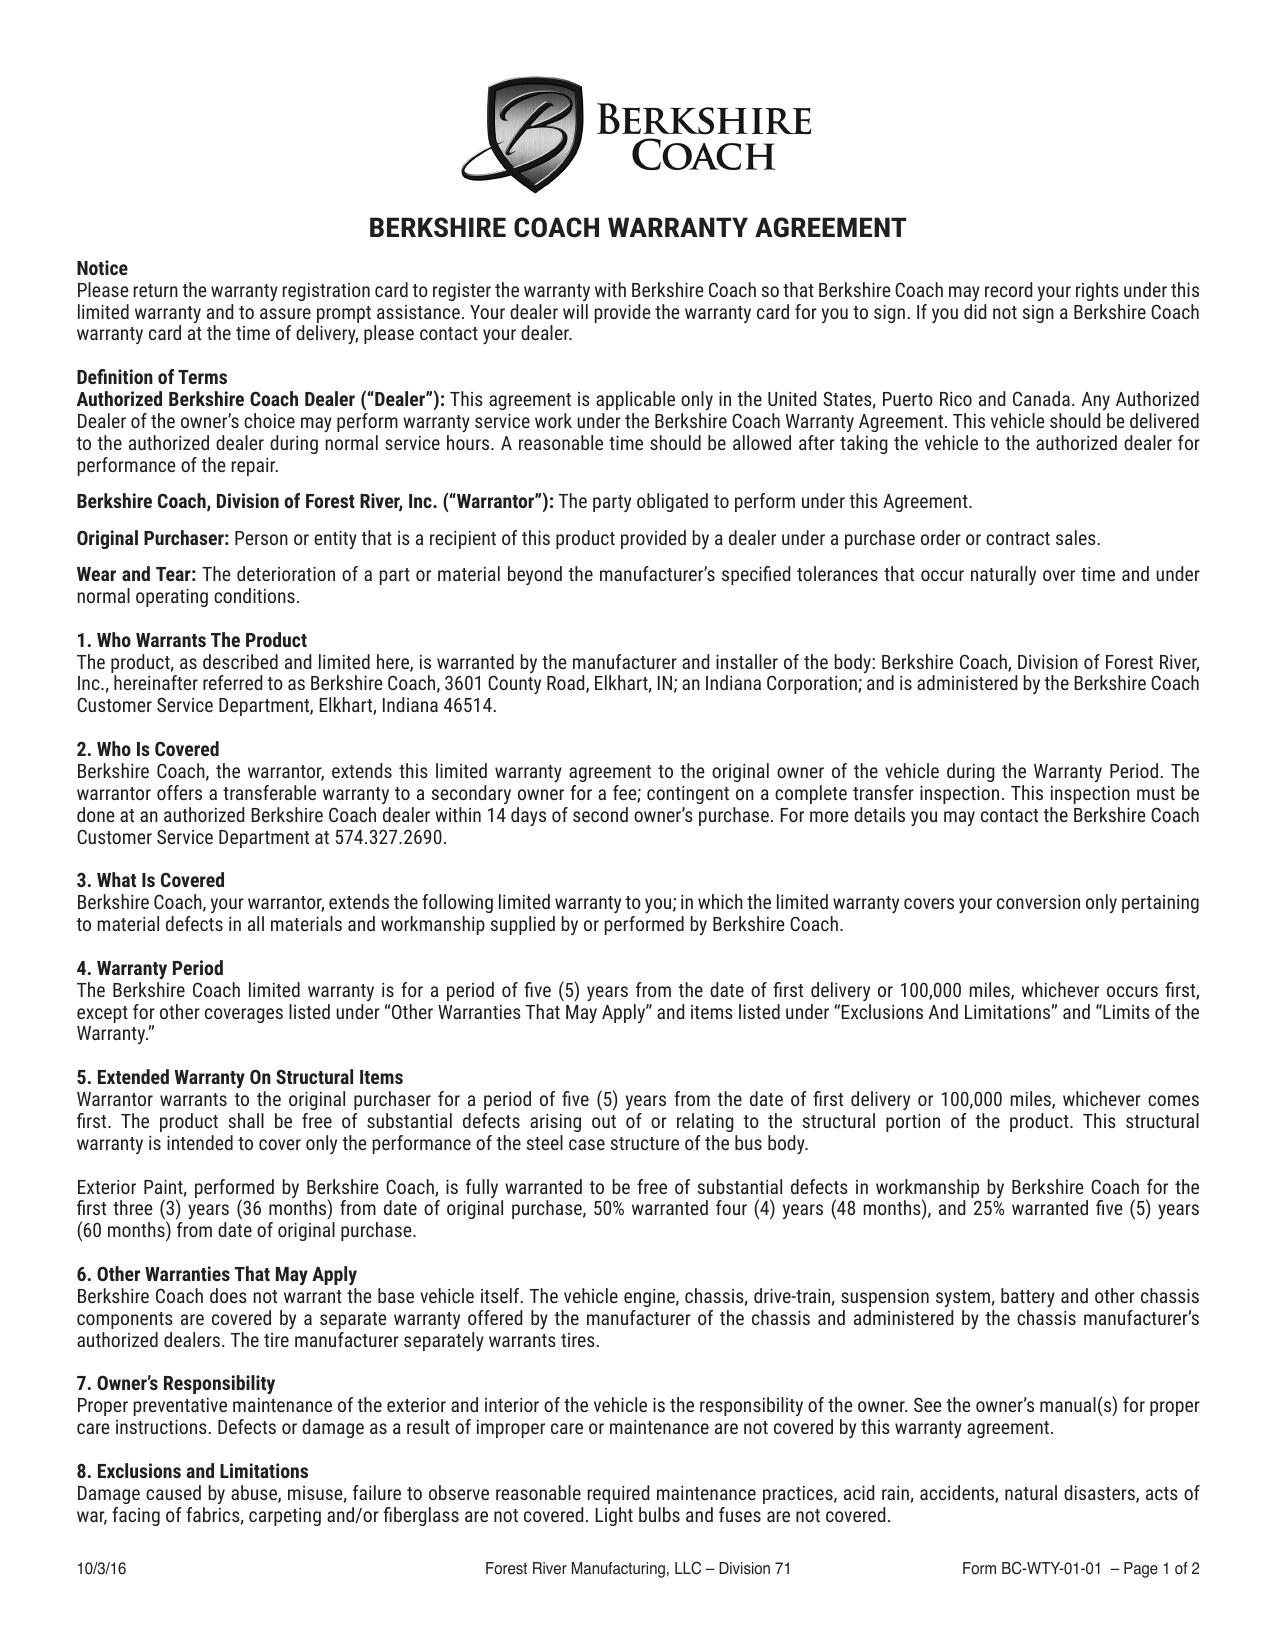 Berkshire Coach Warranty Agreement  Manualzz With Limited Warranty Agreement Template